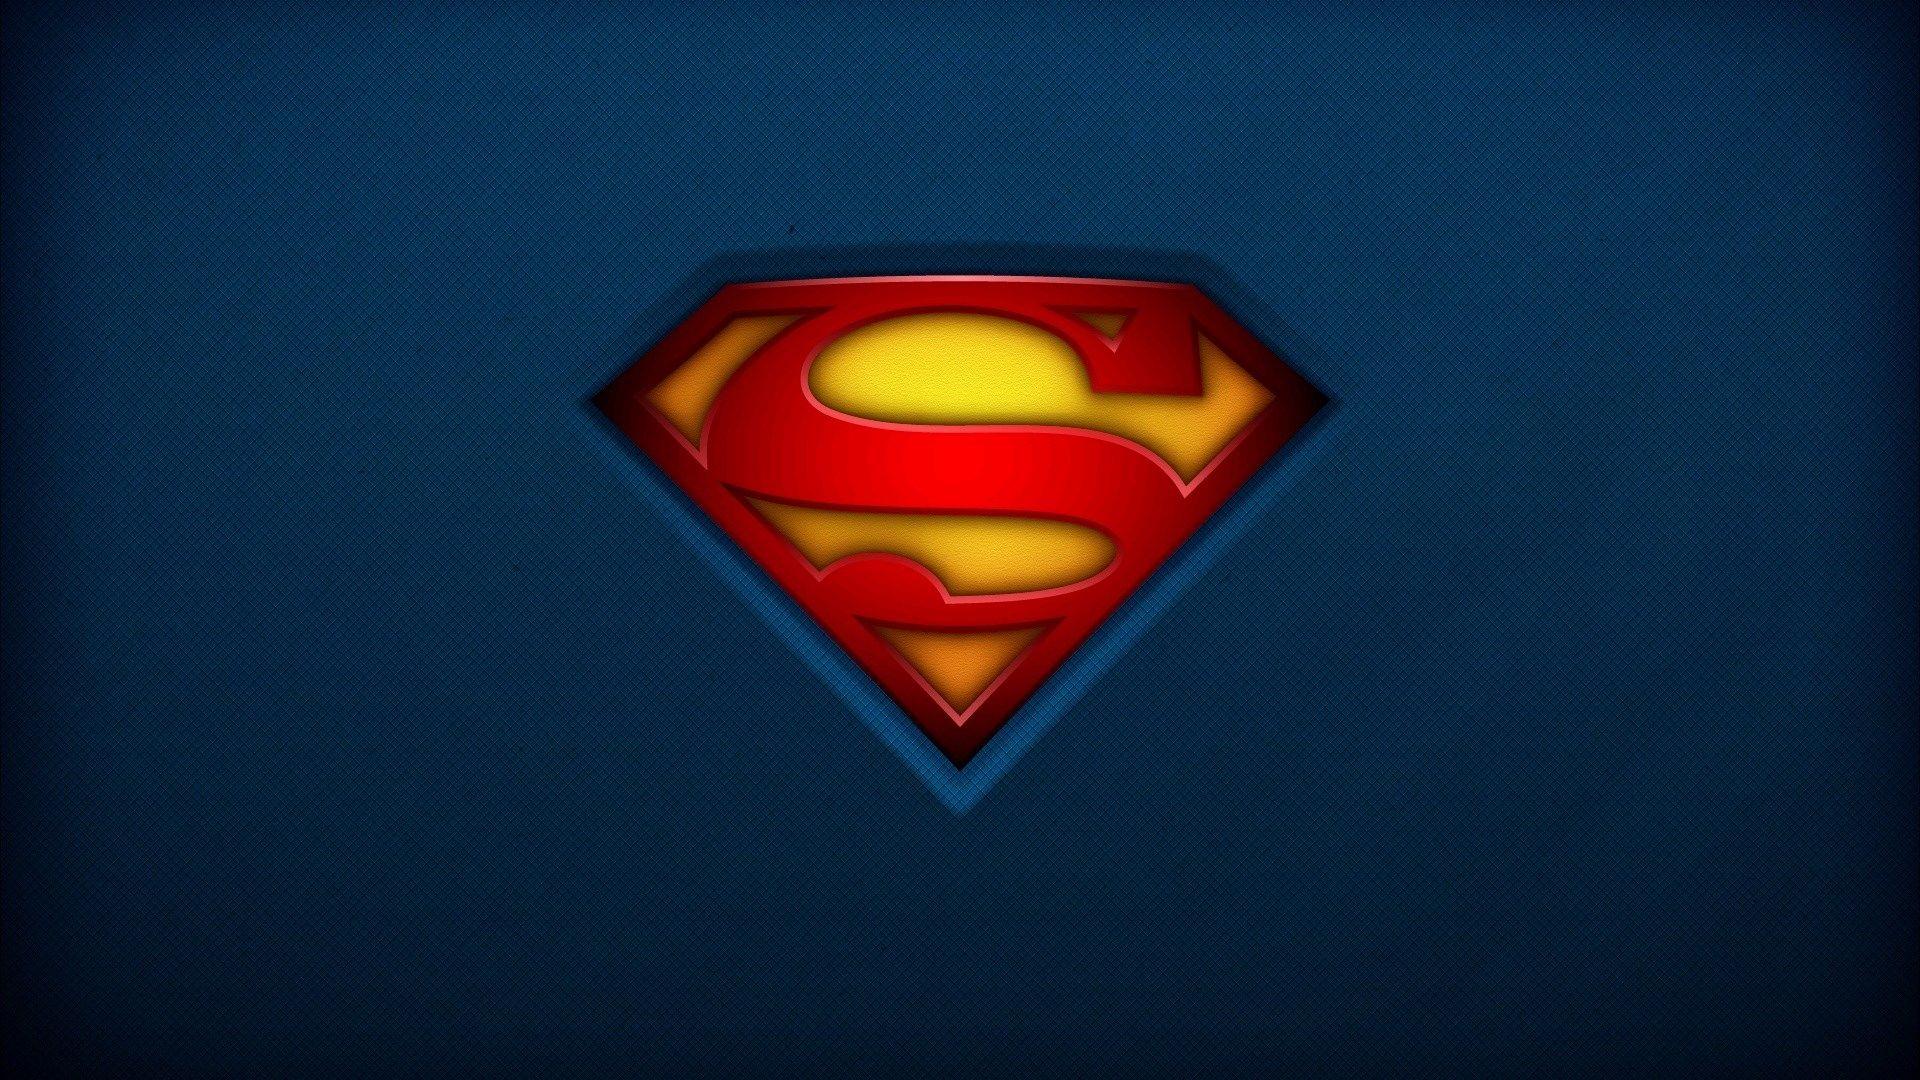 Most Inspiring Wallpaper Mac Superhero - 5ad07486b51c1562915d558968be3030  Trends_95943.jpg